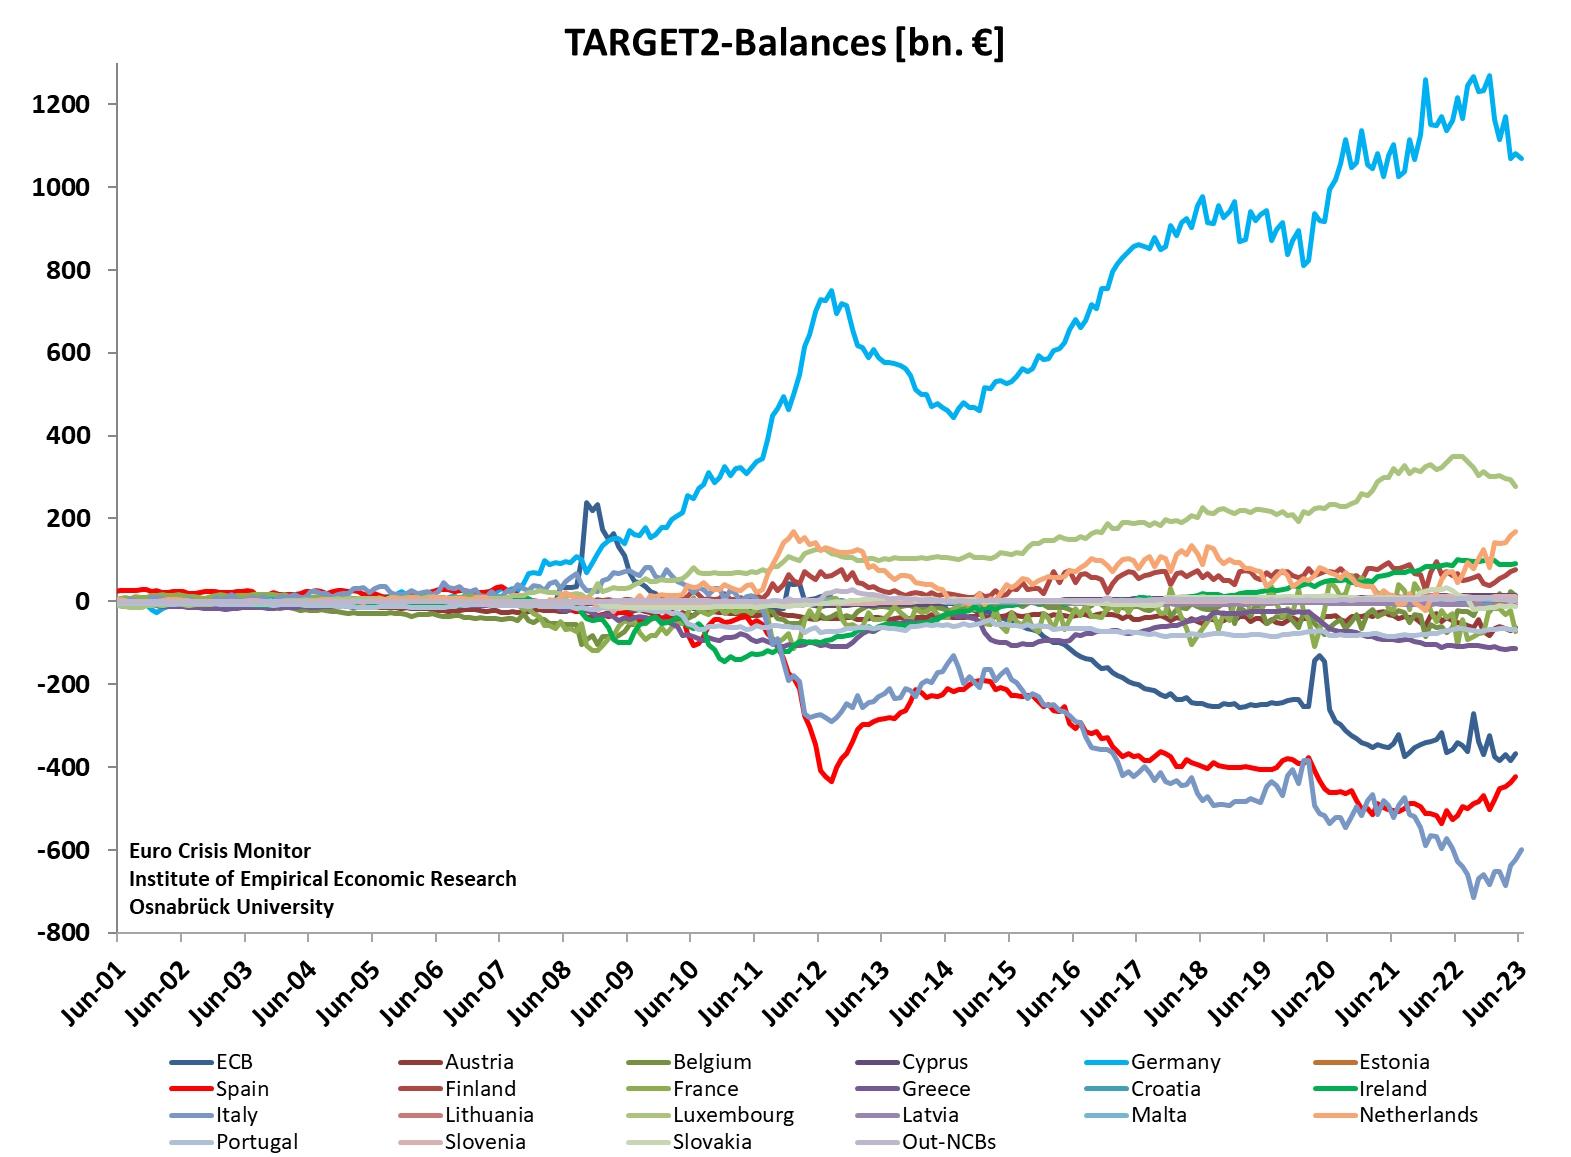 [http://www.eurocrisismonitor.com/img/Target2%20graph%20-%20%20ecb%20data.jpg]